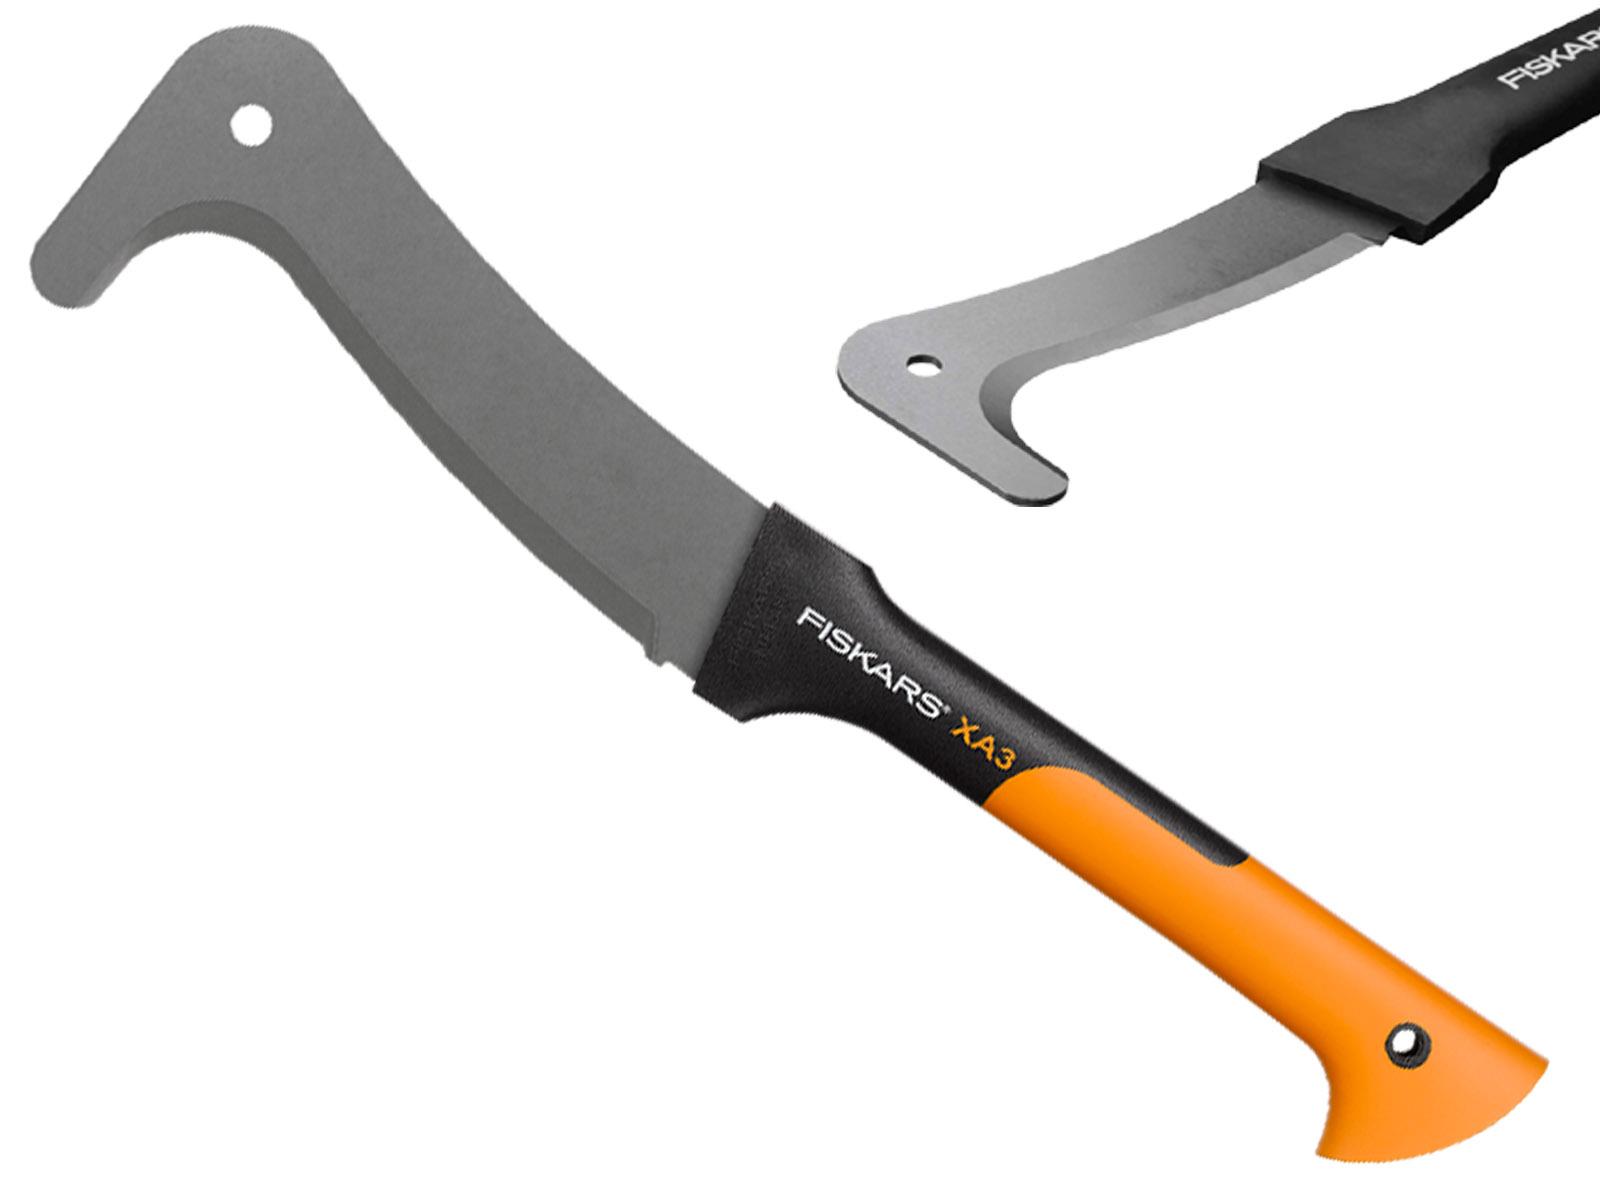 Fiskars Нож секач XA3 126004 МАЧЕТЕ